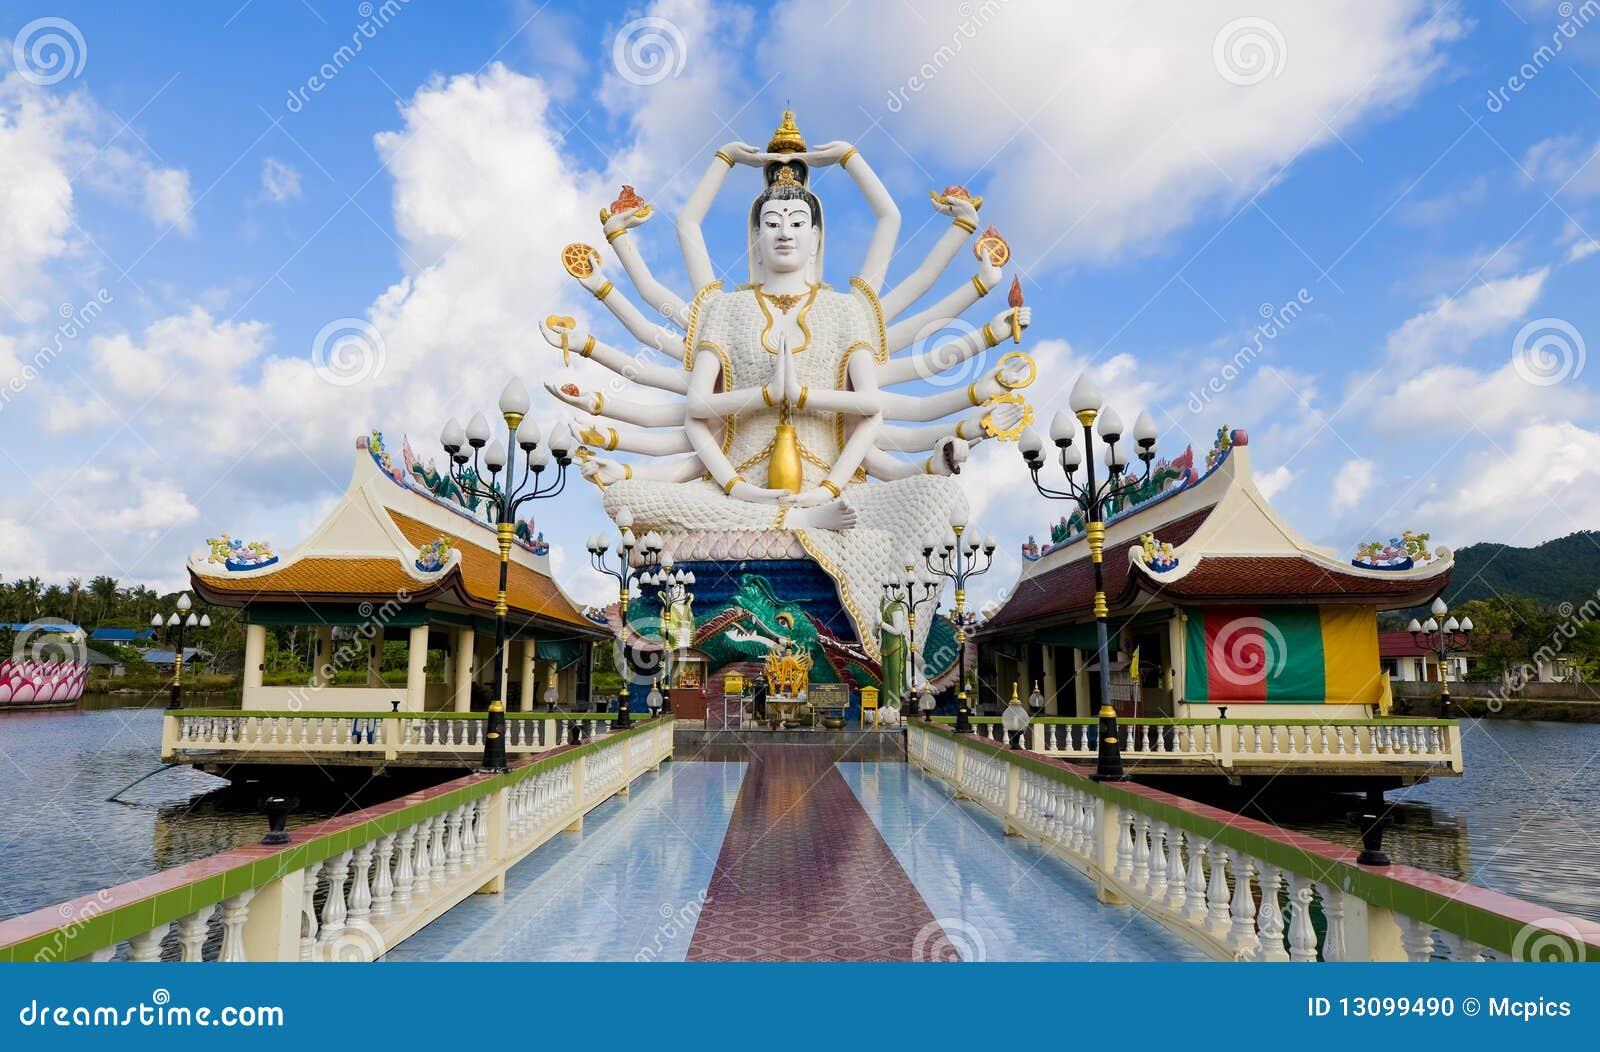 Shiva statue in koh samui